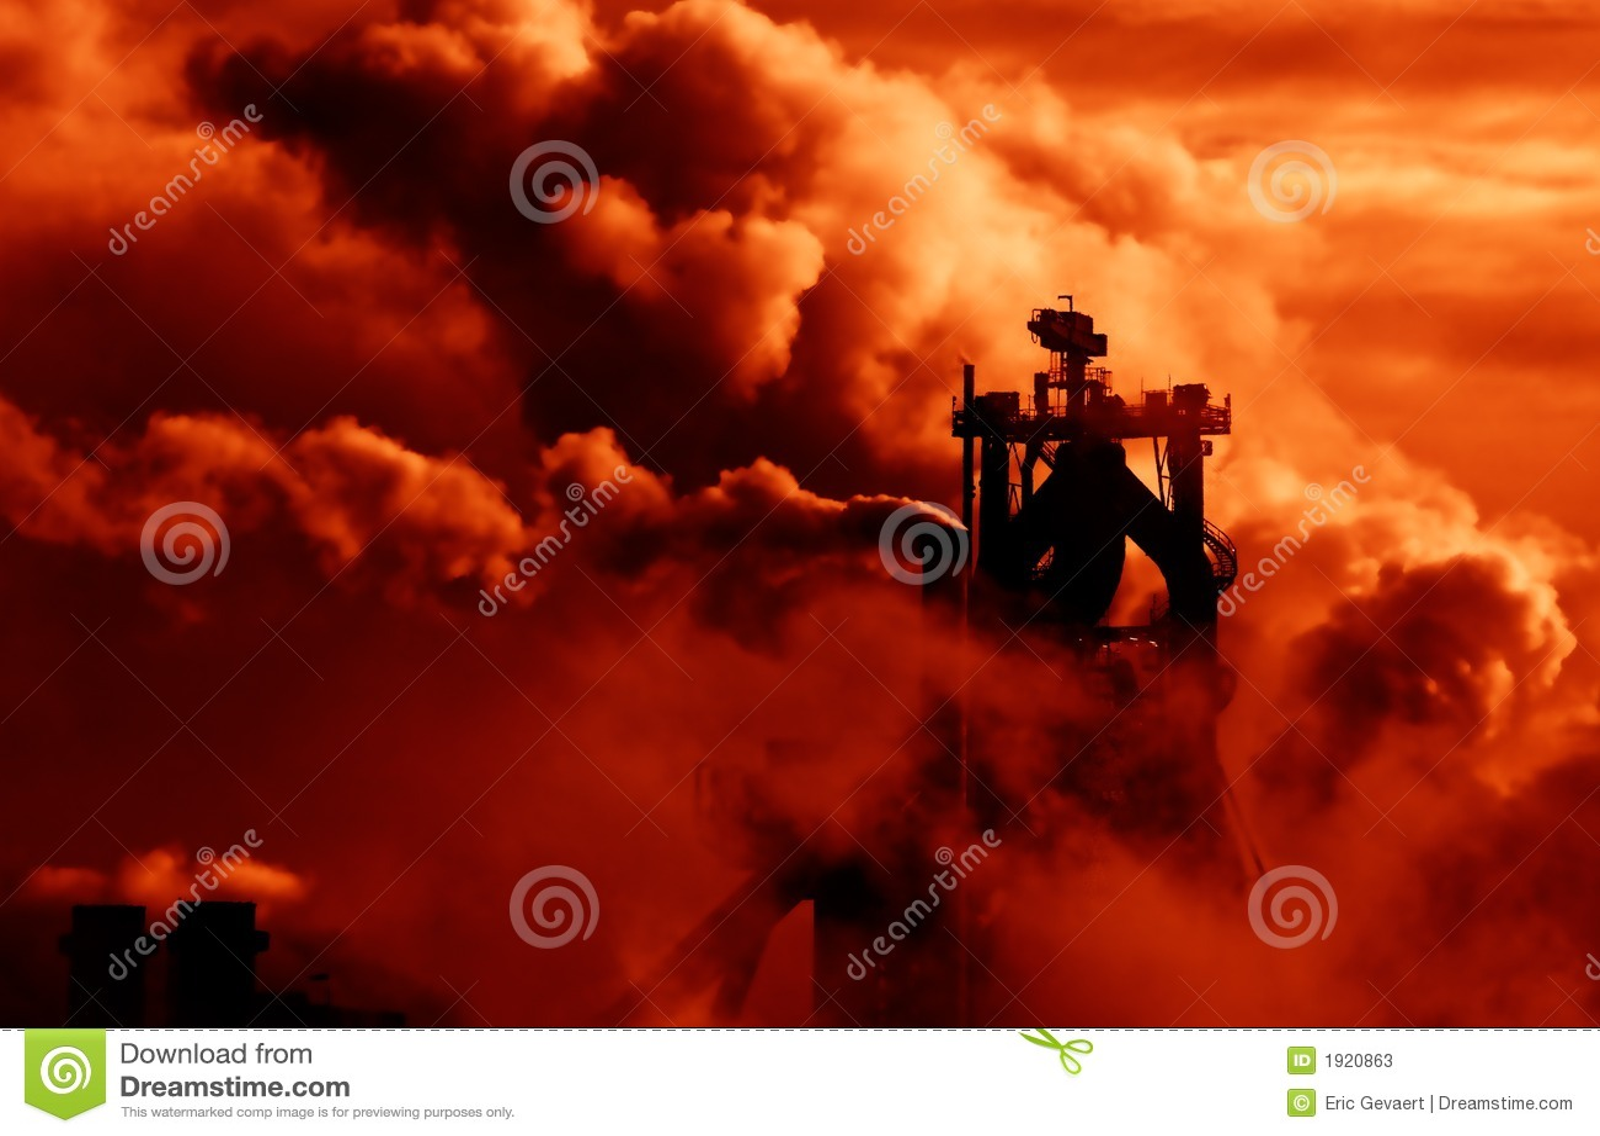 Industriële rook